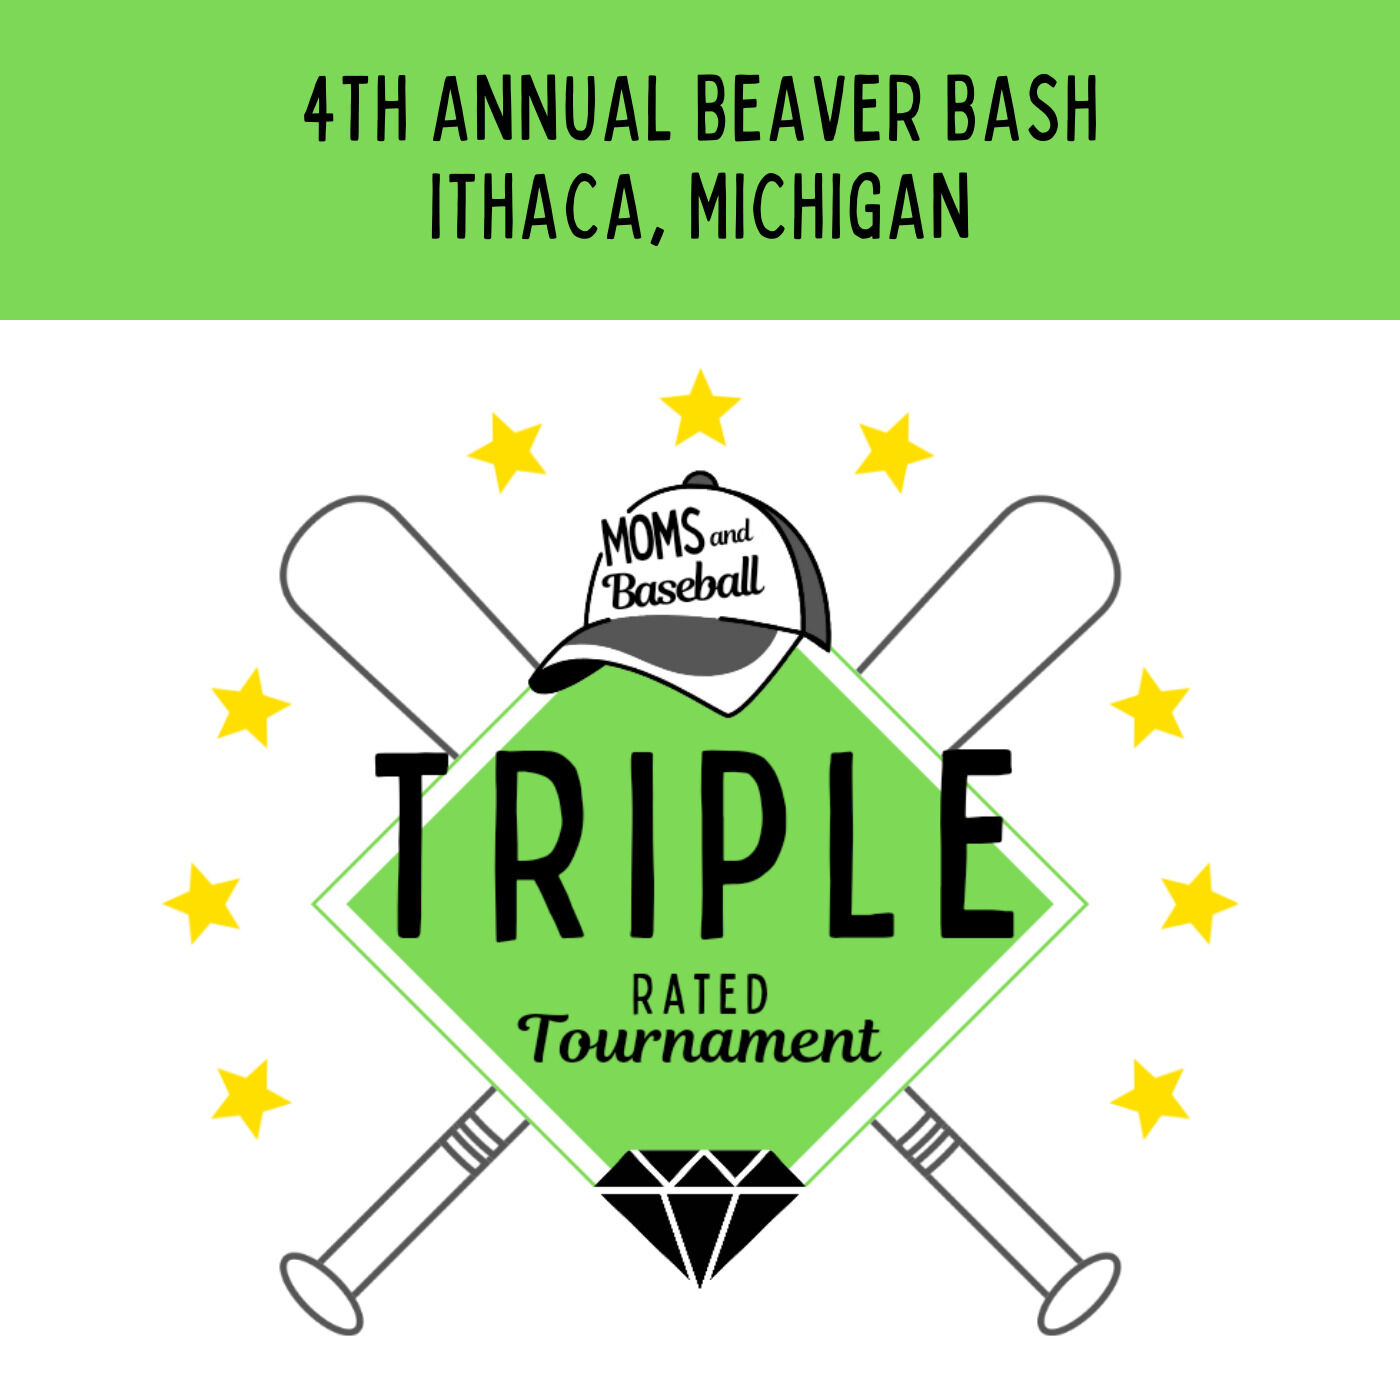 040: Beaver Bash Review (Michigan)